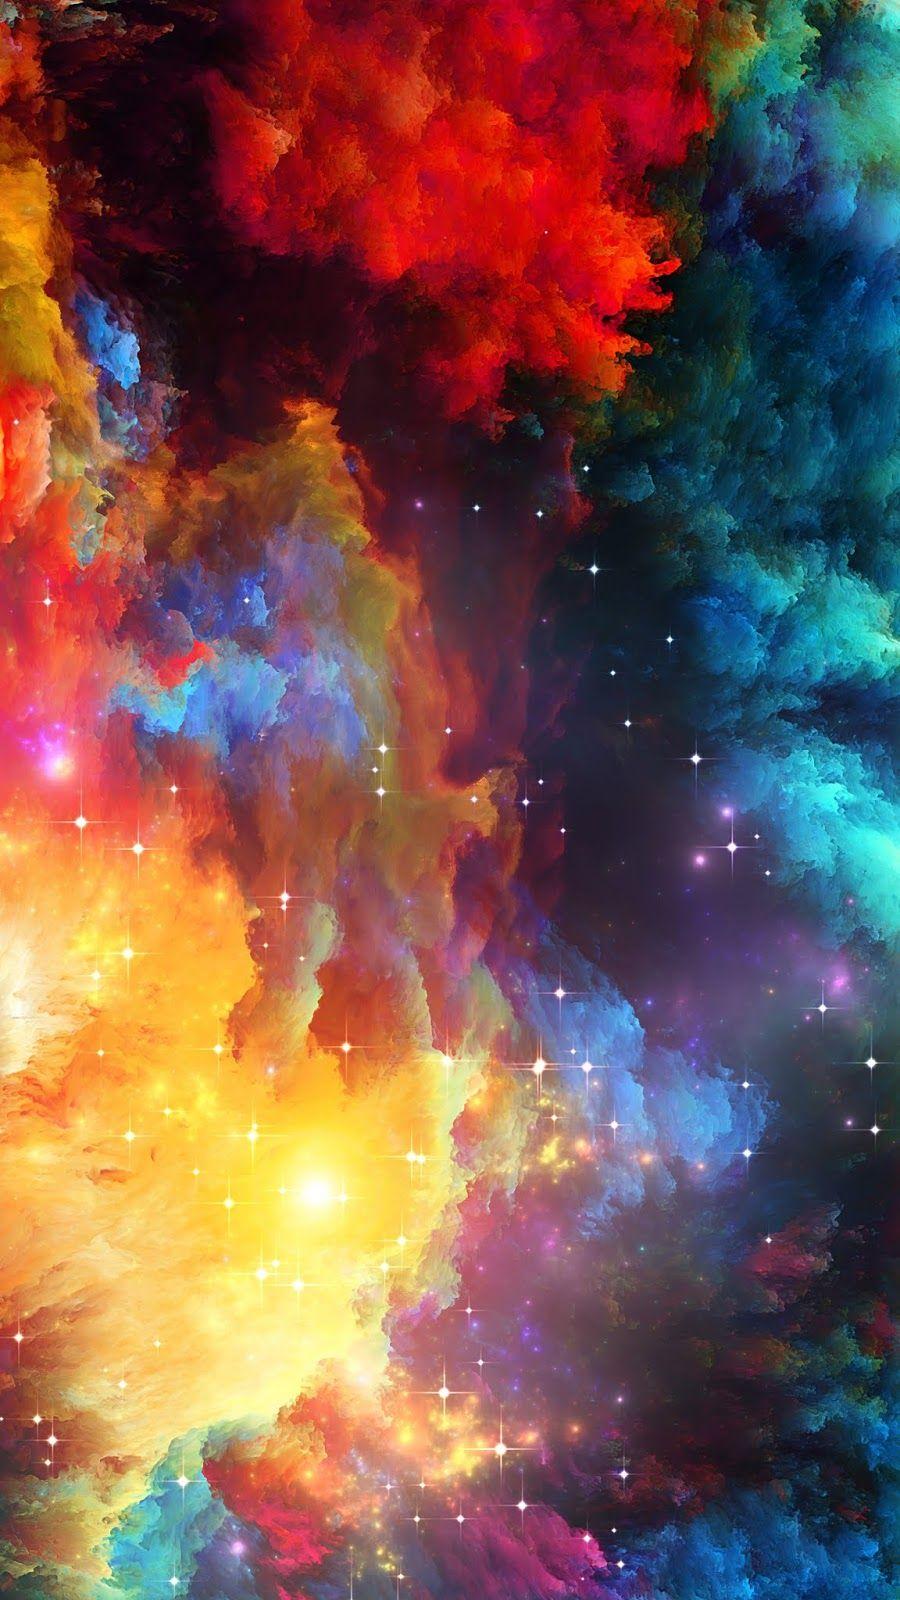 Colorful wallpaper galaxy wallpaper color wallpaper - Colorful galaxy wallpaper ...